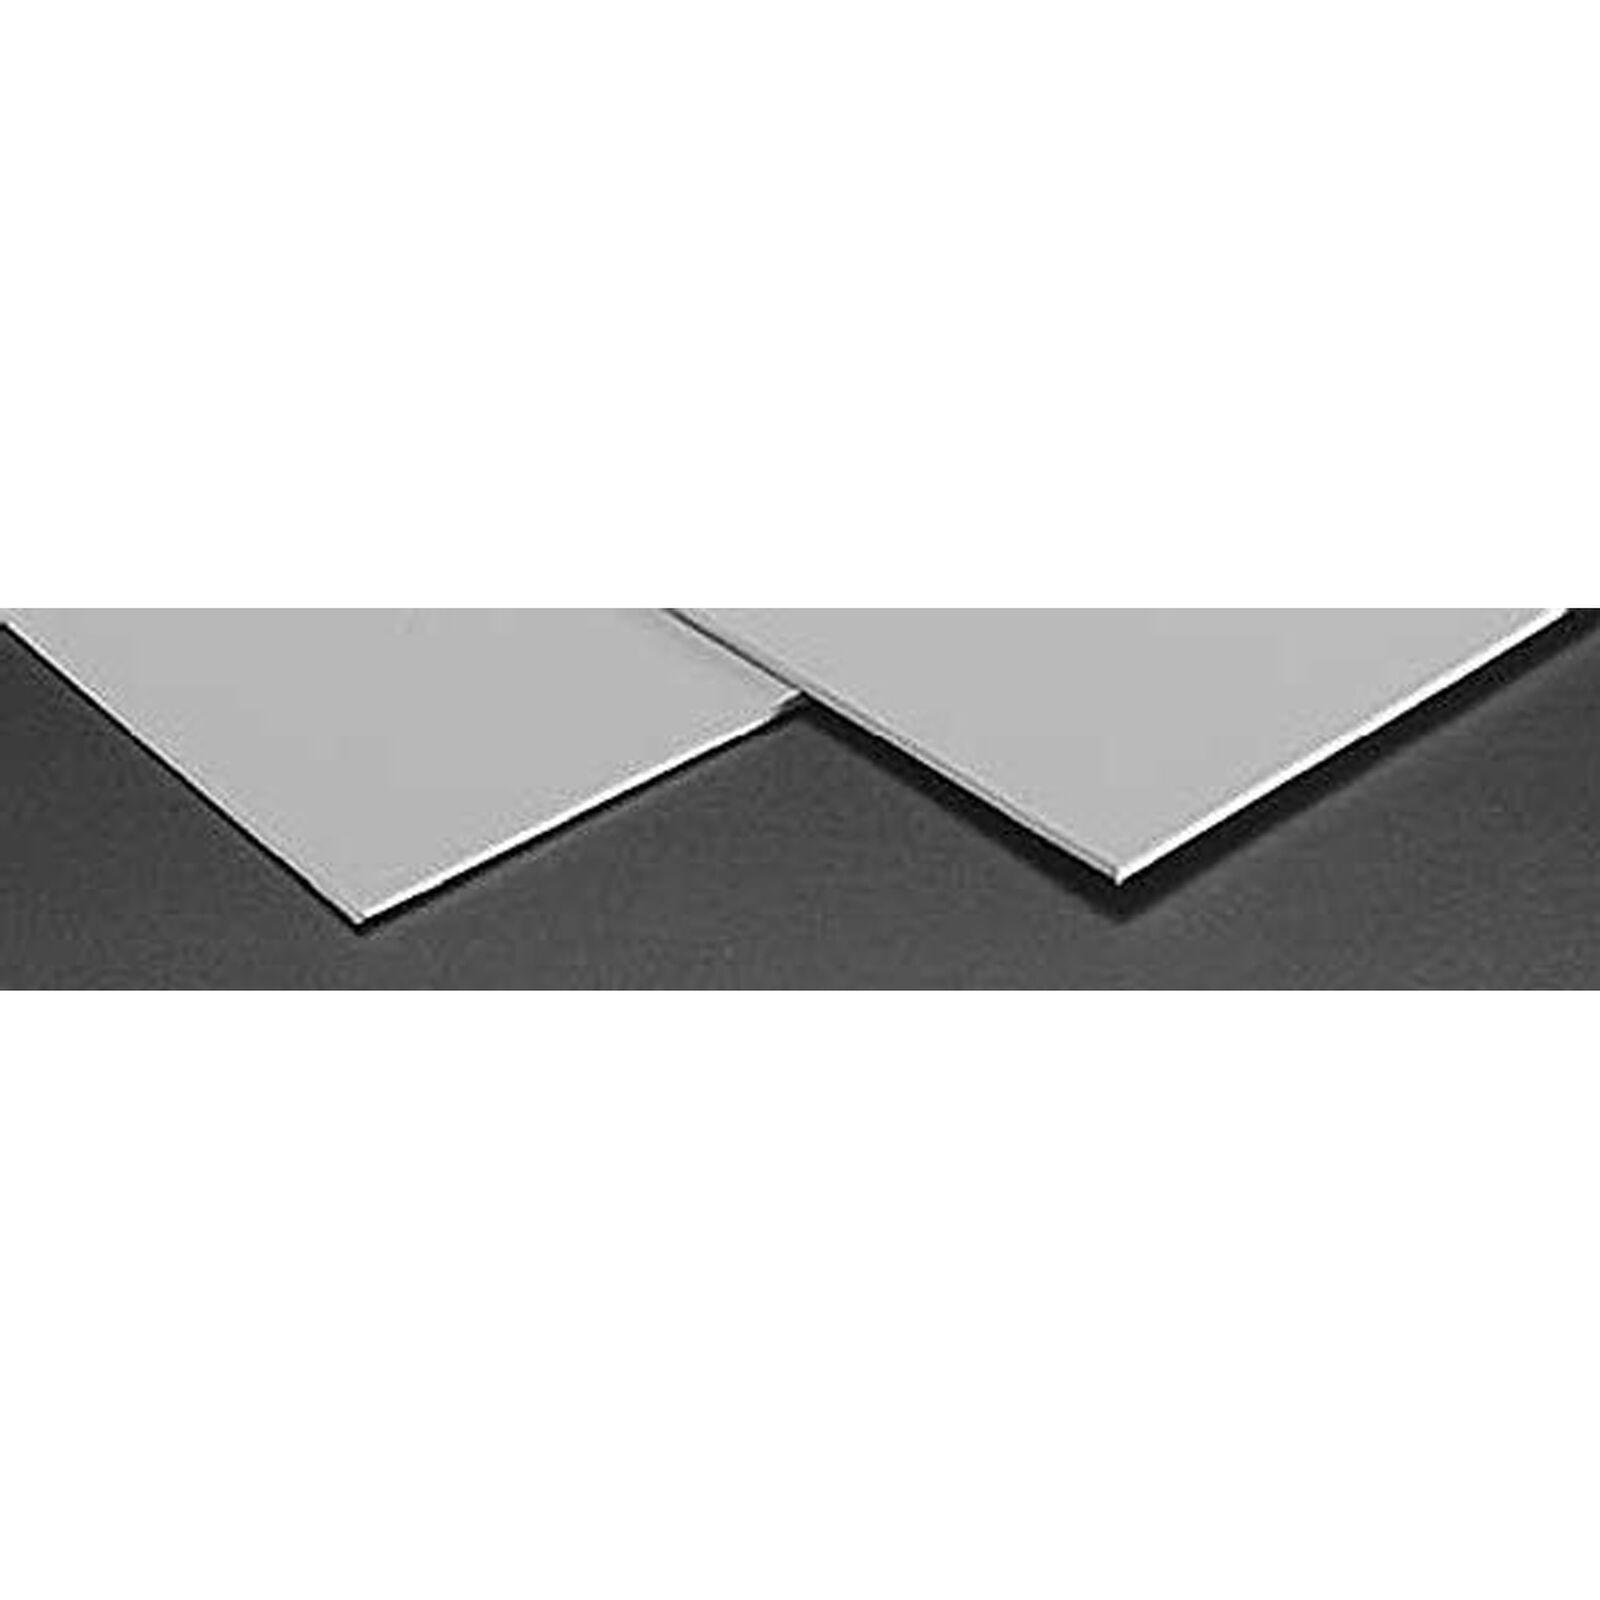 SSA-108 Gray ABS,.080 (2)